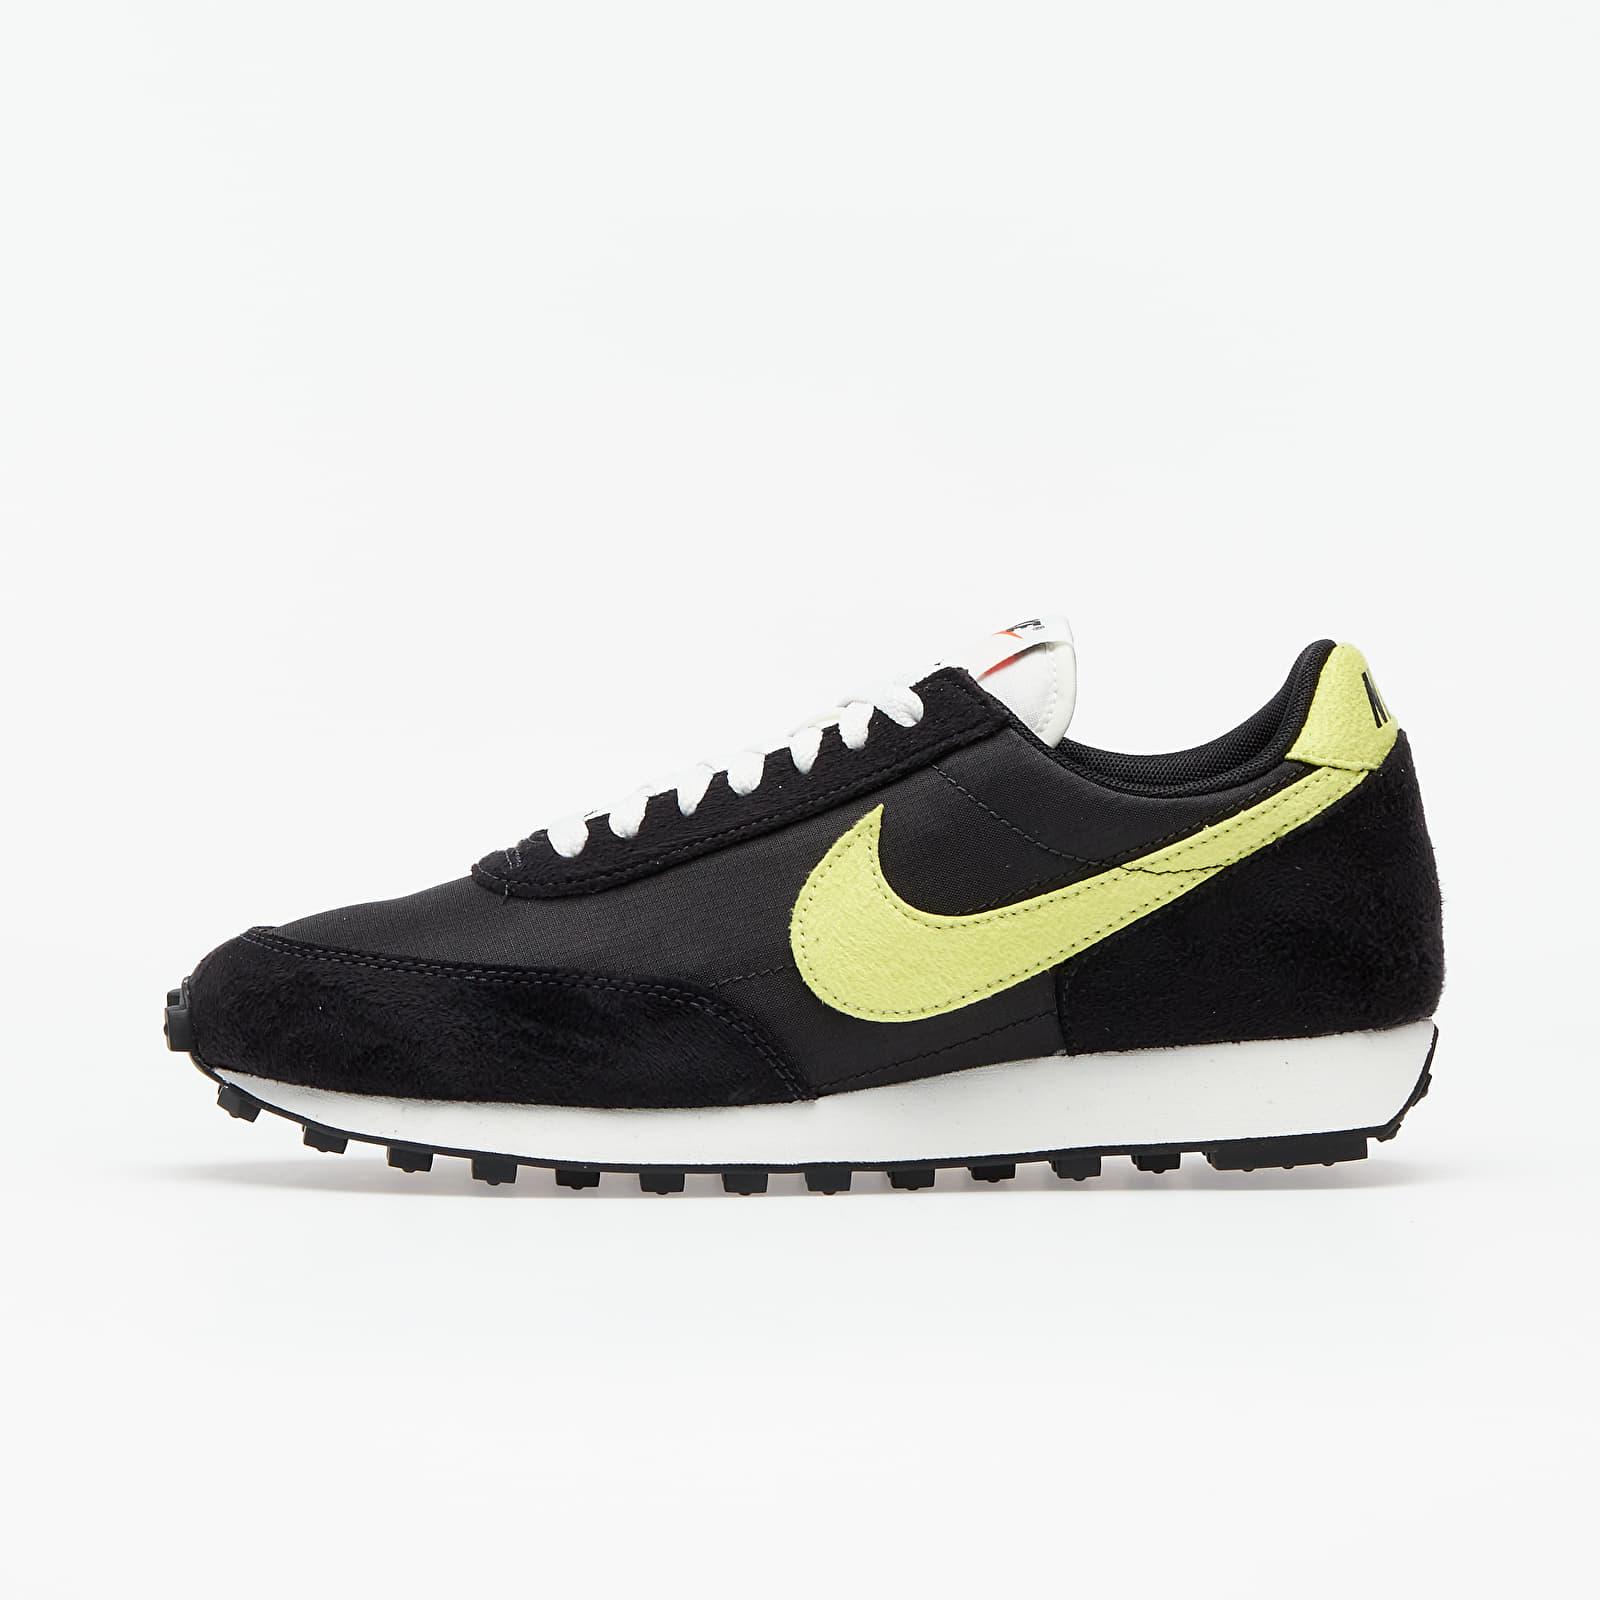 Men's shoes Nike Daybreak SP Black/ Limelight-Off Noir-Summit White